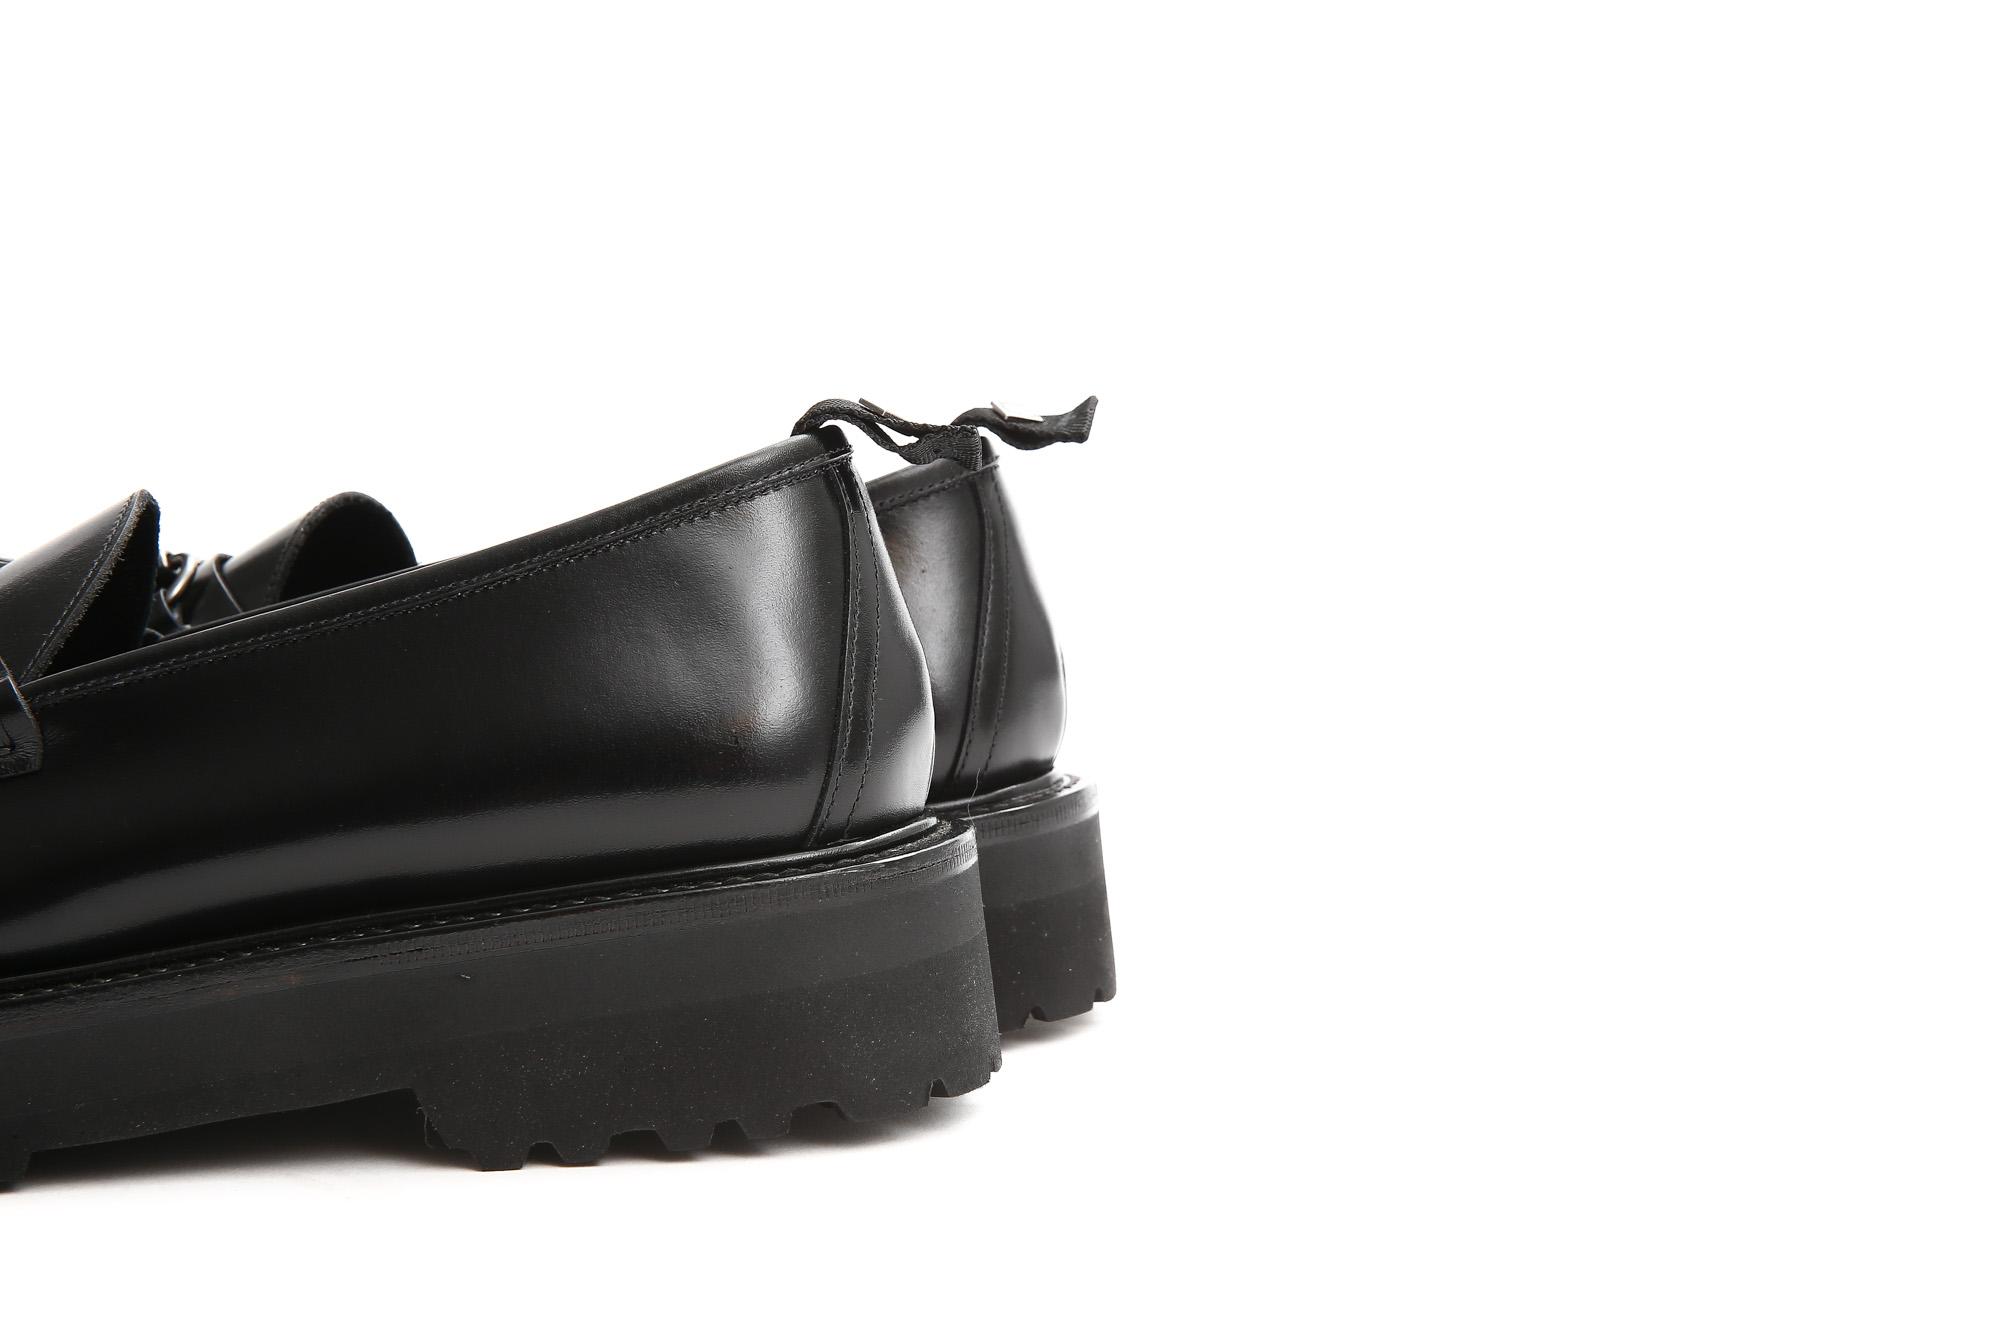 WH (ダブルエイチ) WHZ-0504 Bit Loafer (干場氏 別注 店舗限定 スペシャル モデル) TOOL-442 Last (トゥルー 442 ラスト) ANNONAY Vocalou Calf Leather ビットローファー ALL BLACK (オールブラック・BLK) MADE IN JAPAN(日本製) 2018秋冬 【限定スペシャルモデル】【ご予約受付中】 愛知 名古屋 Alto e Diritto アルトエデリット yoshimasahoshiba 干場スペシャル 干場義雅 坪内浩 坪内 forzastyle フォルザスタイル